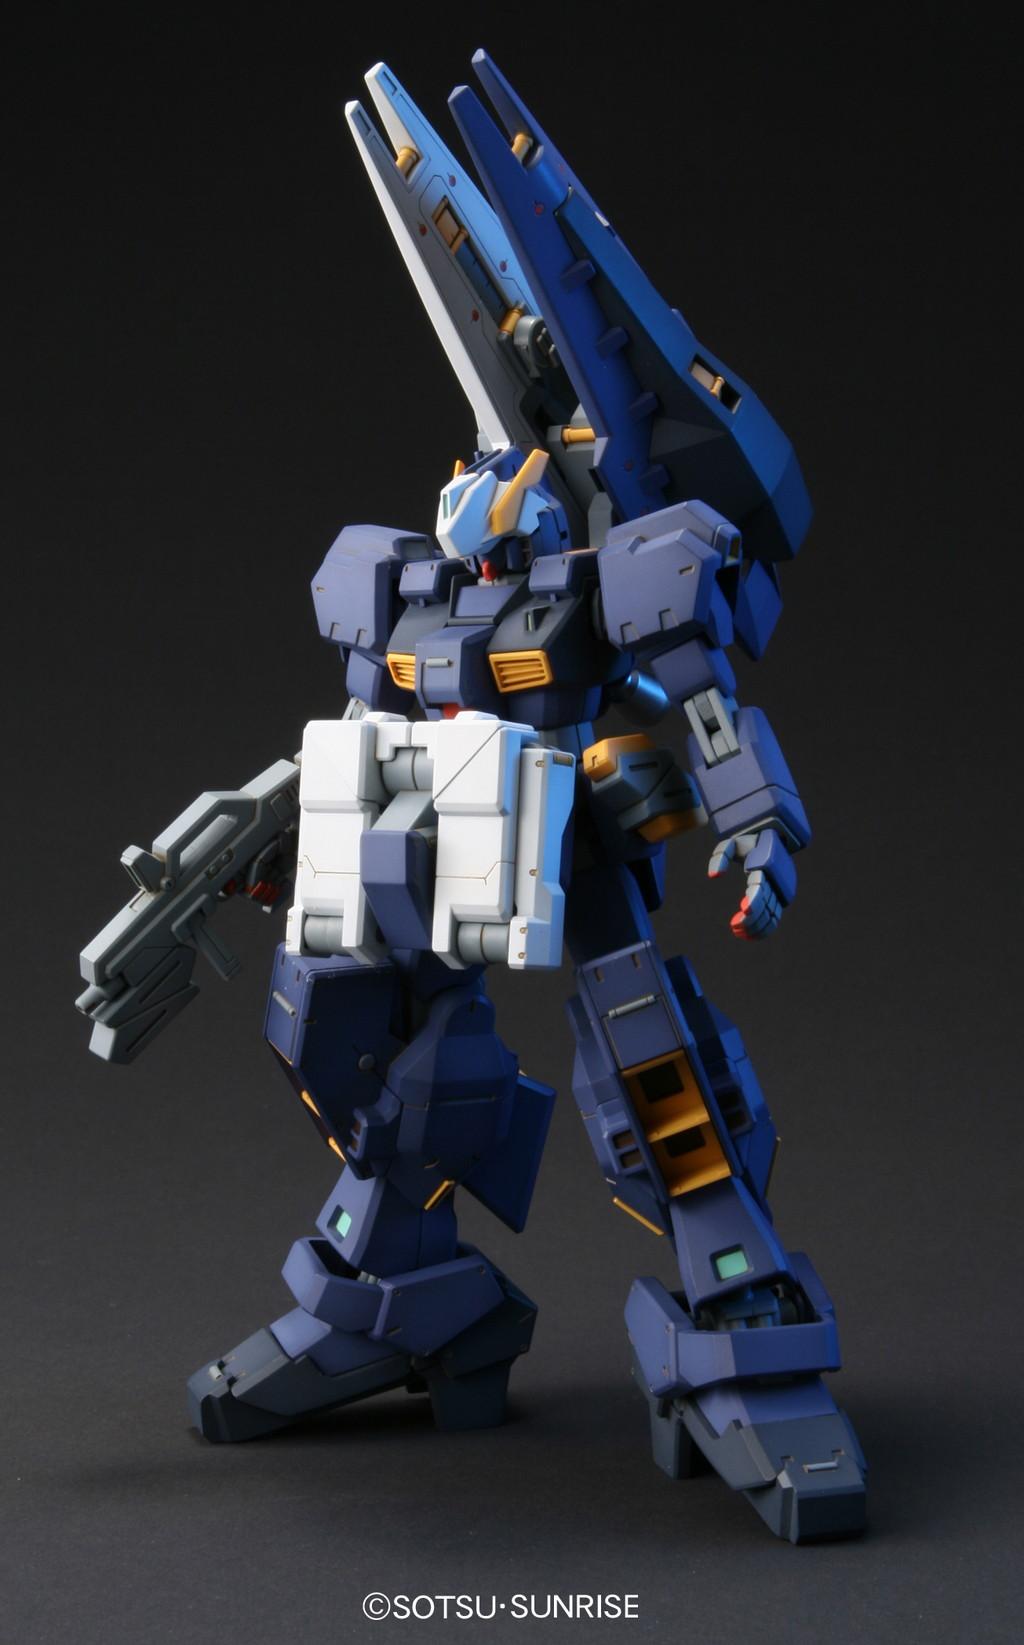 428HGUC 1/144 RX-121-2A ガンダム TR-1[アドバンスド・ヘイズル] [Gundam TR-1 'Advanced Hazel'] 0139592 5060660 4573102606600